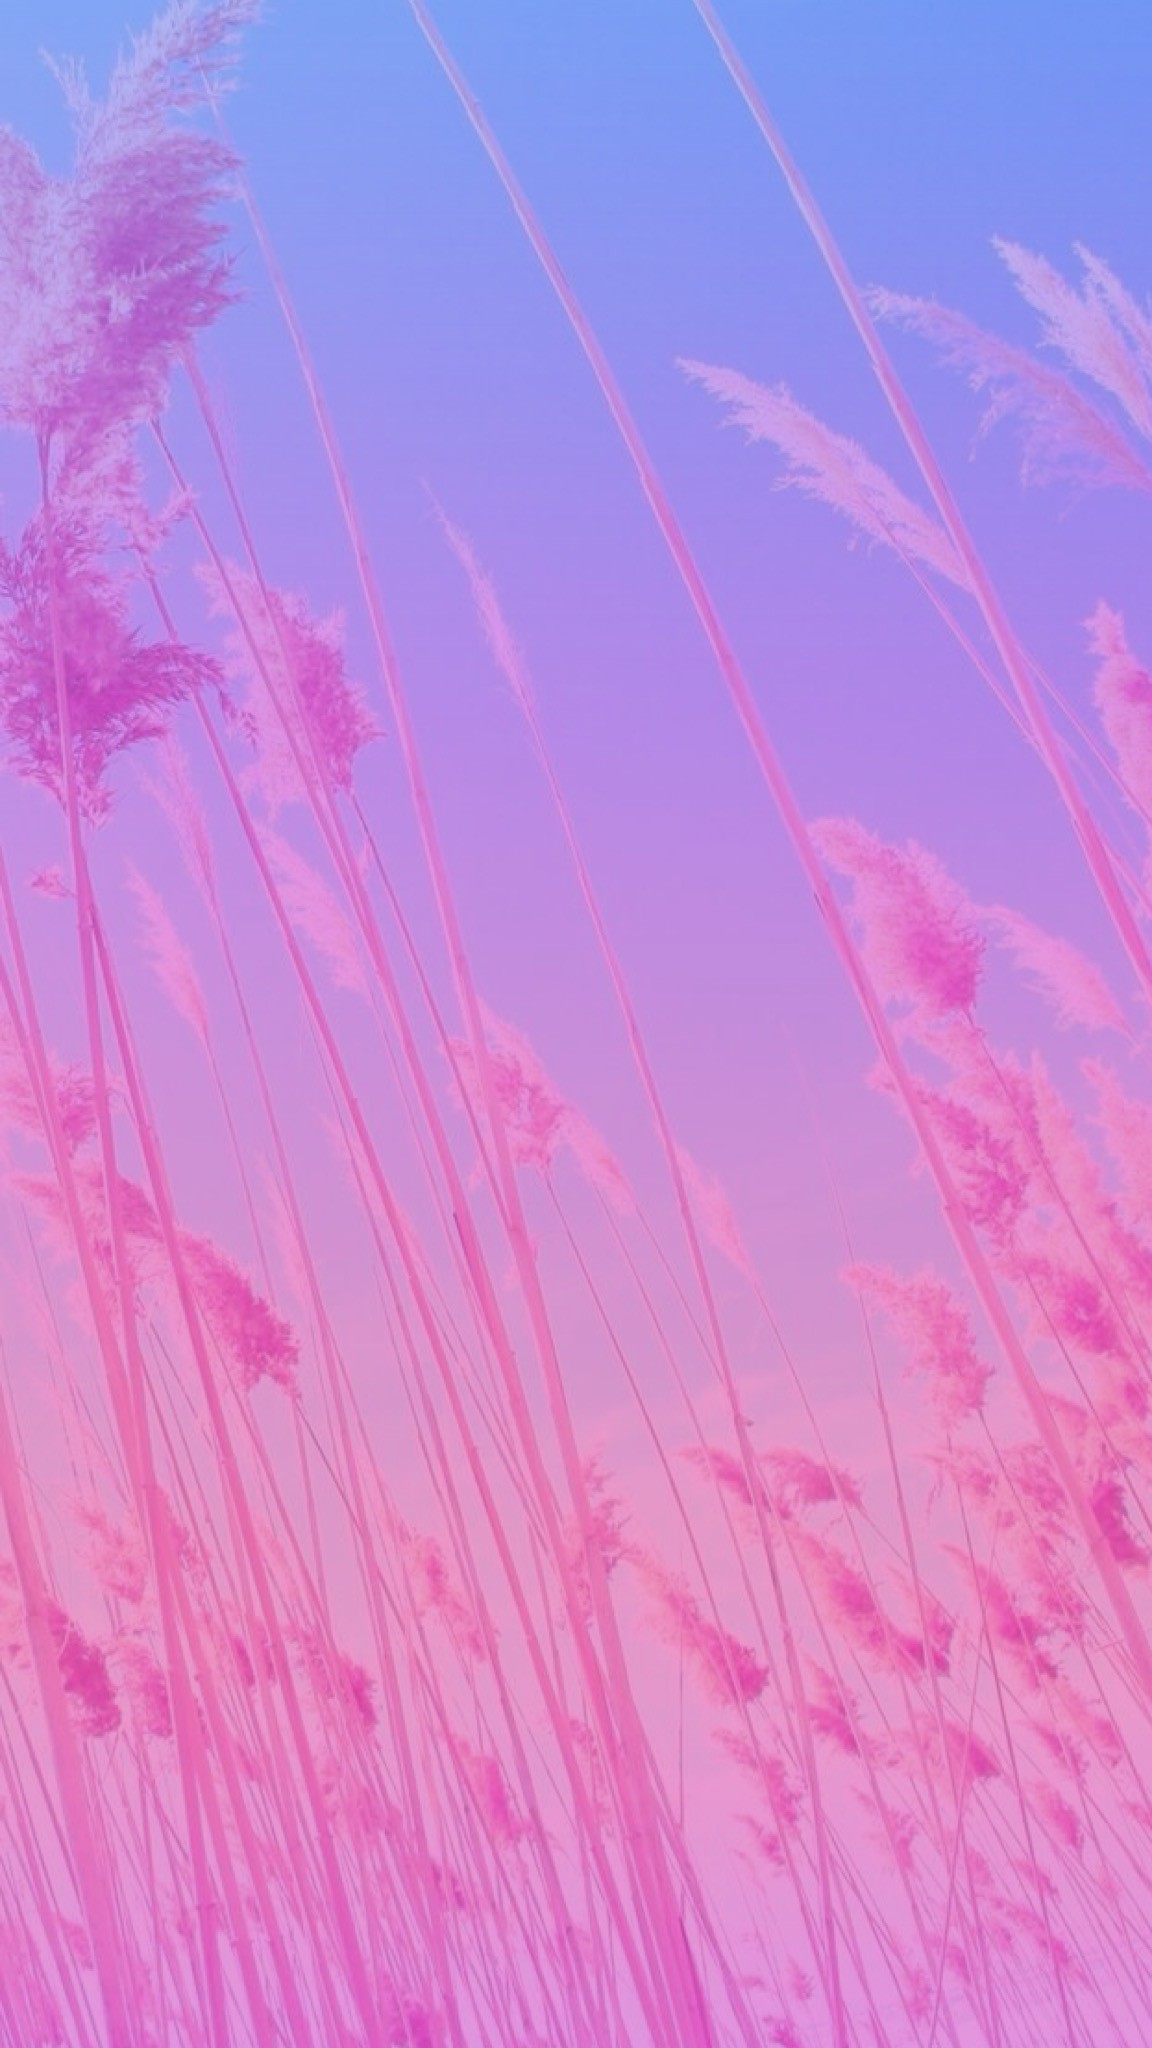 Fall Color Wallpaper For Desktop Purple Flames Background 183 ①